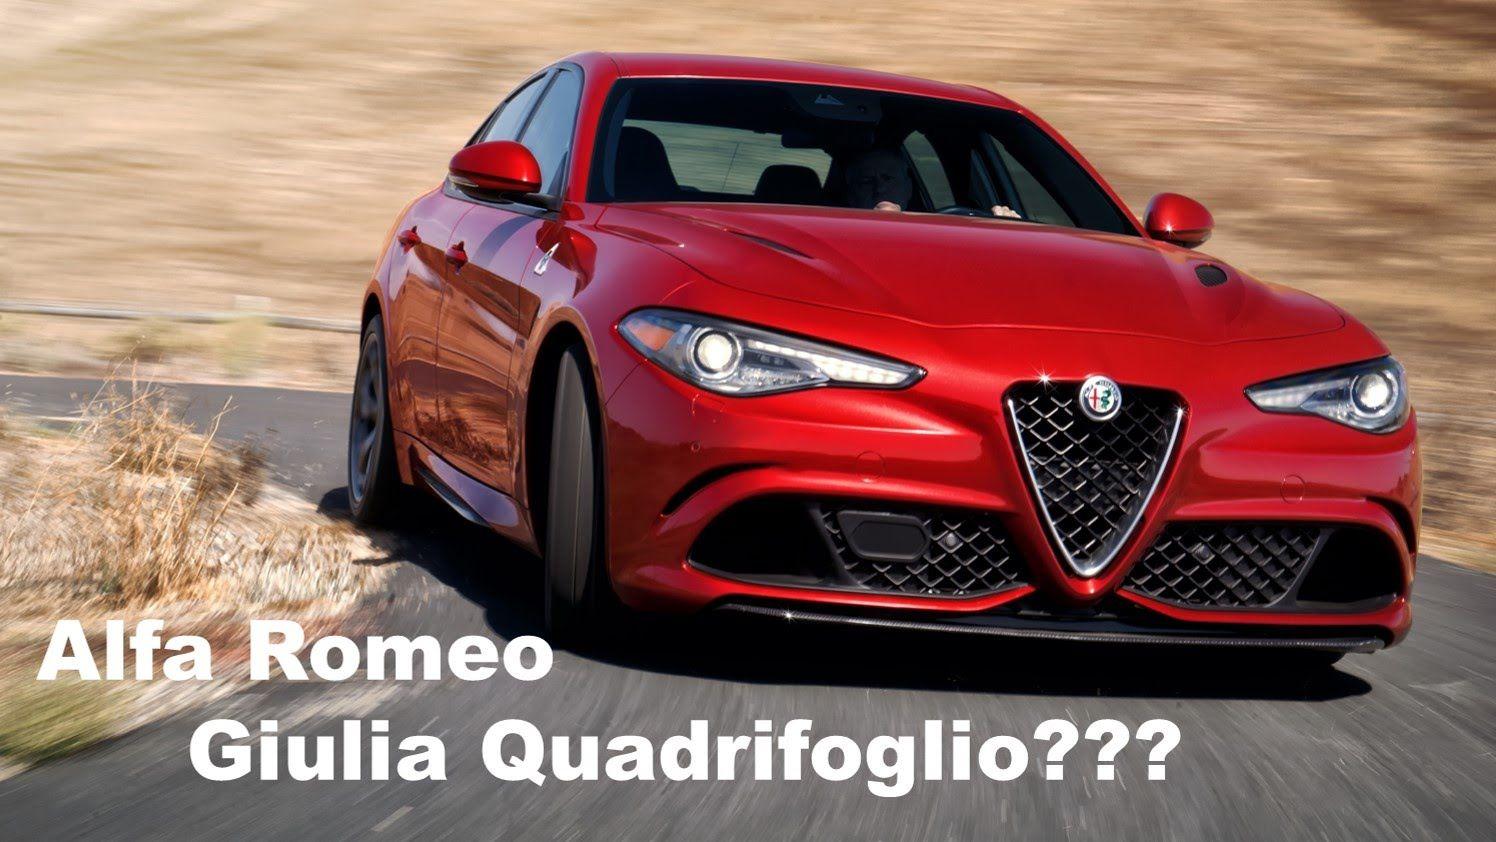 Hardest Car Names To Pronounce Video Items Cars Alfa Romeo